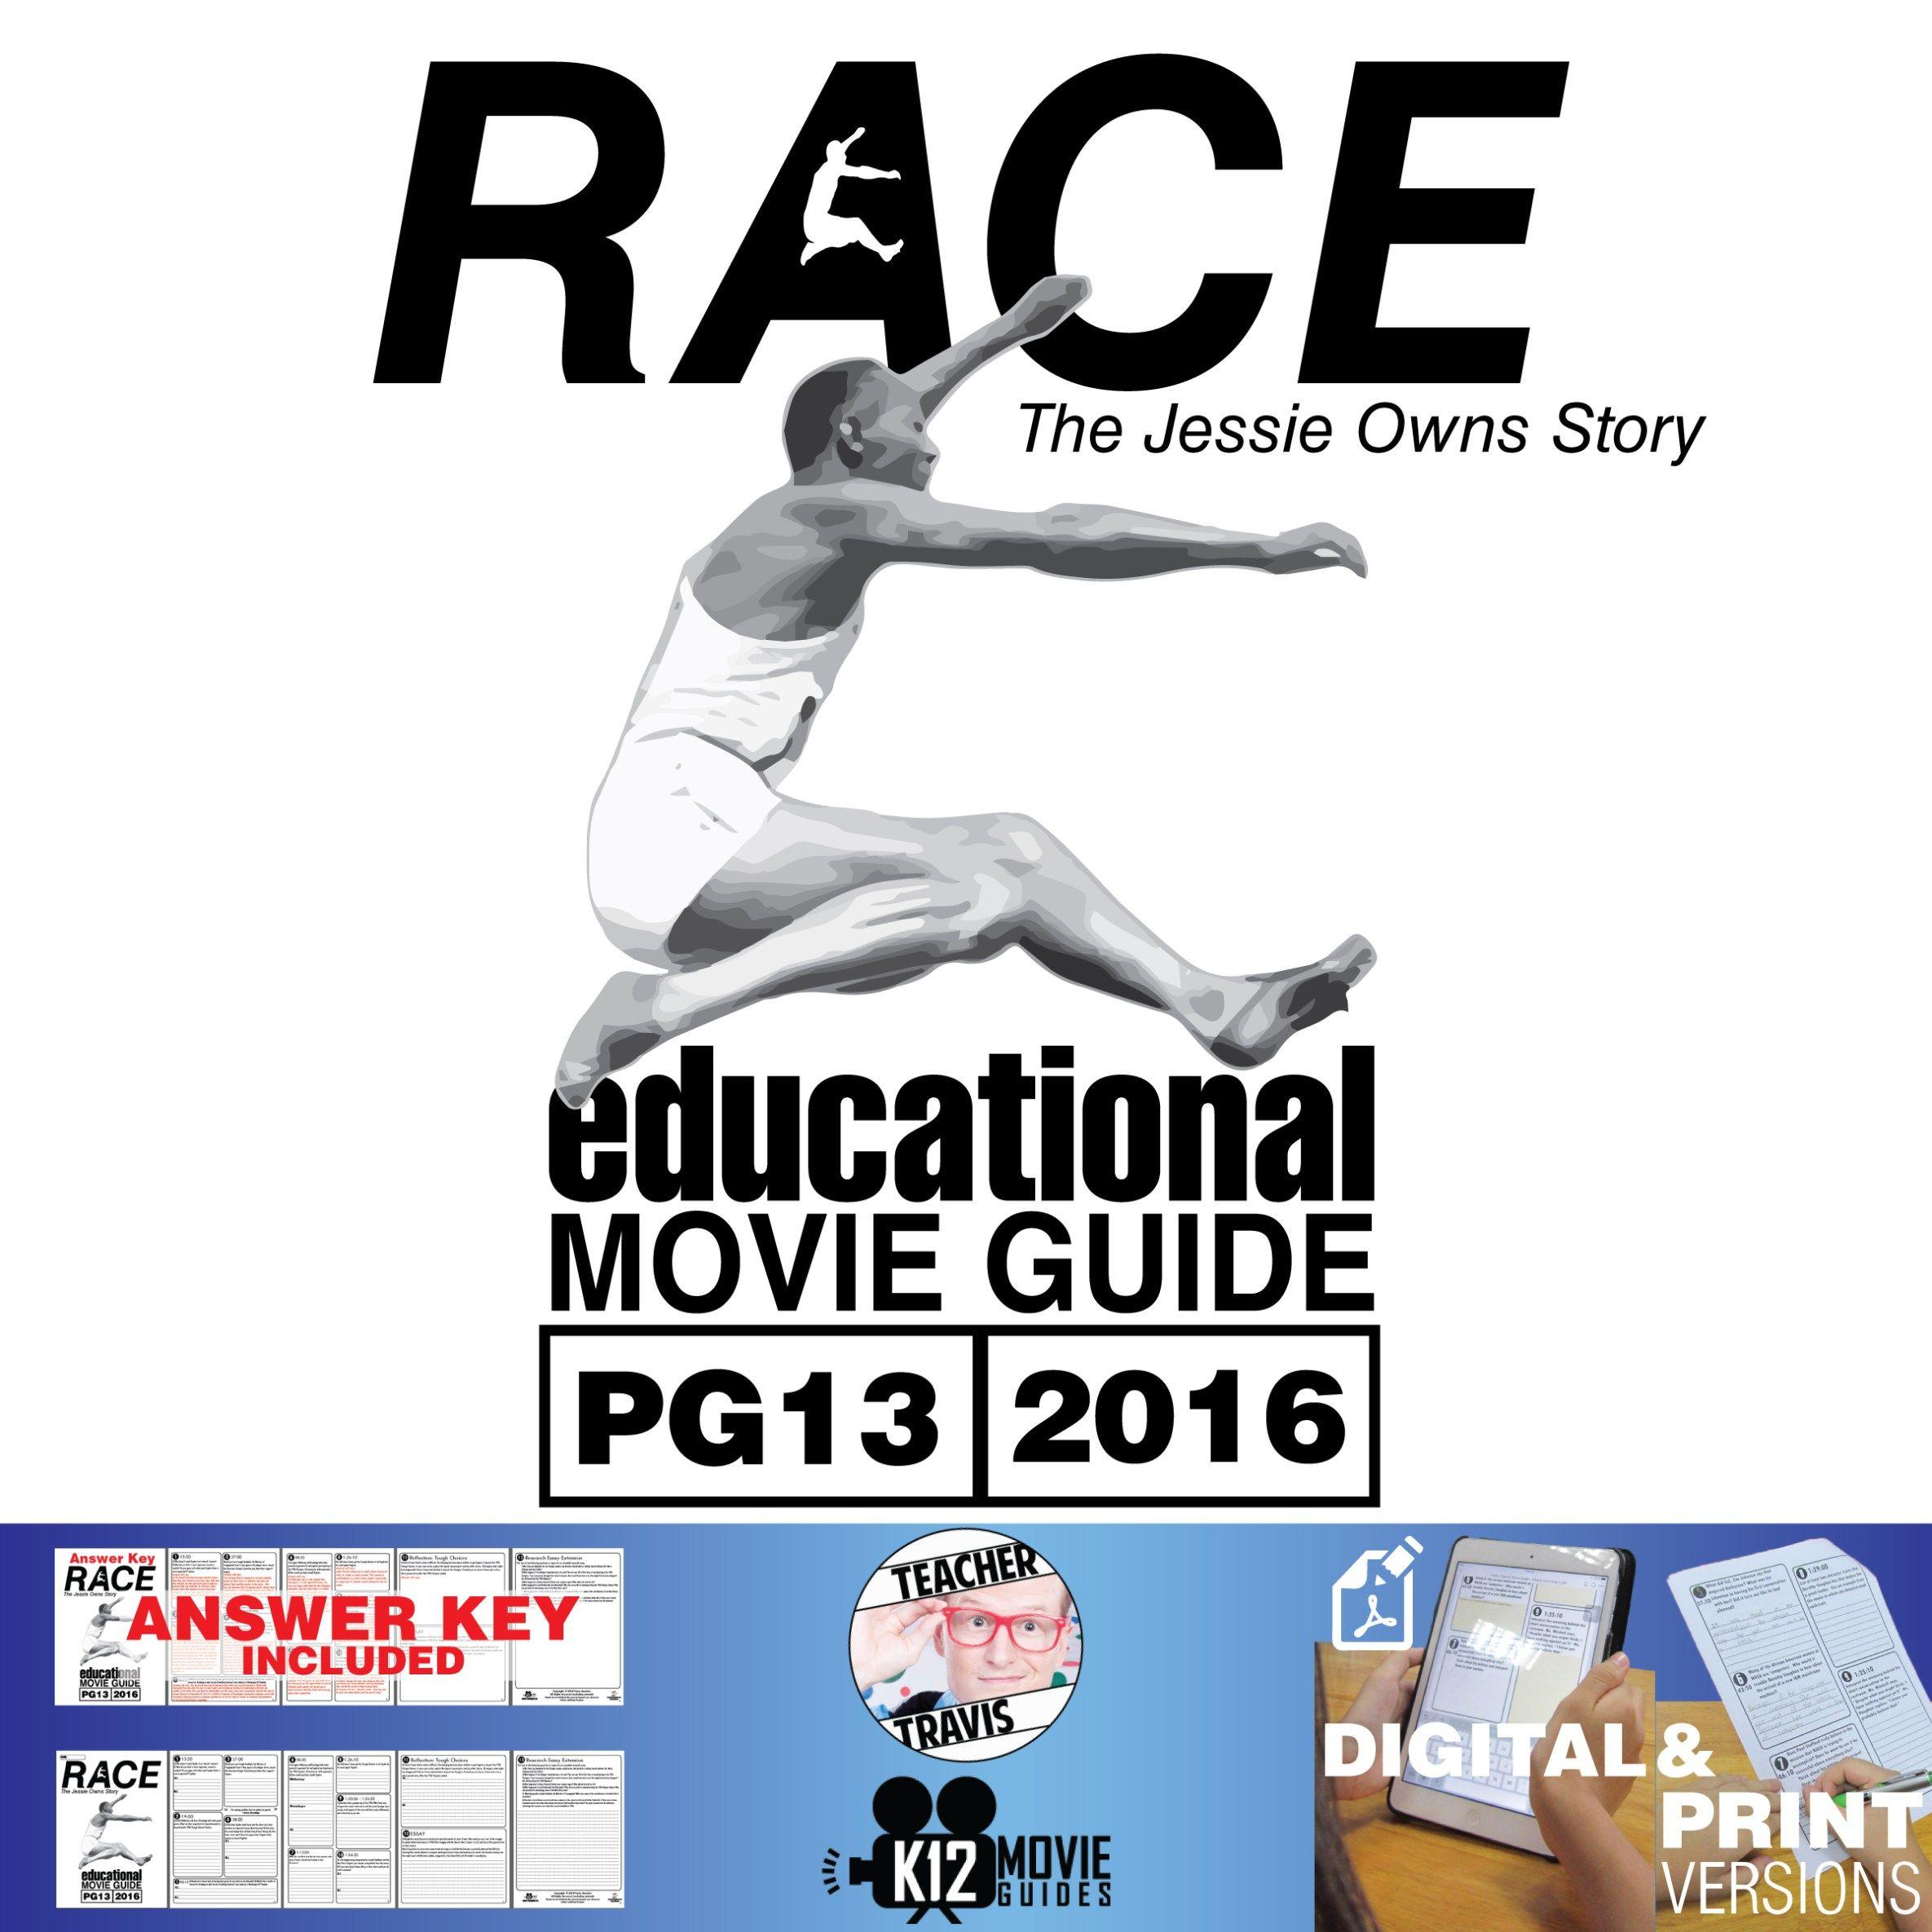 Race Jessie Owens Story Movie Guide